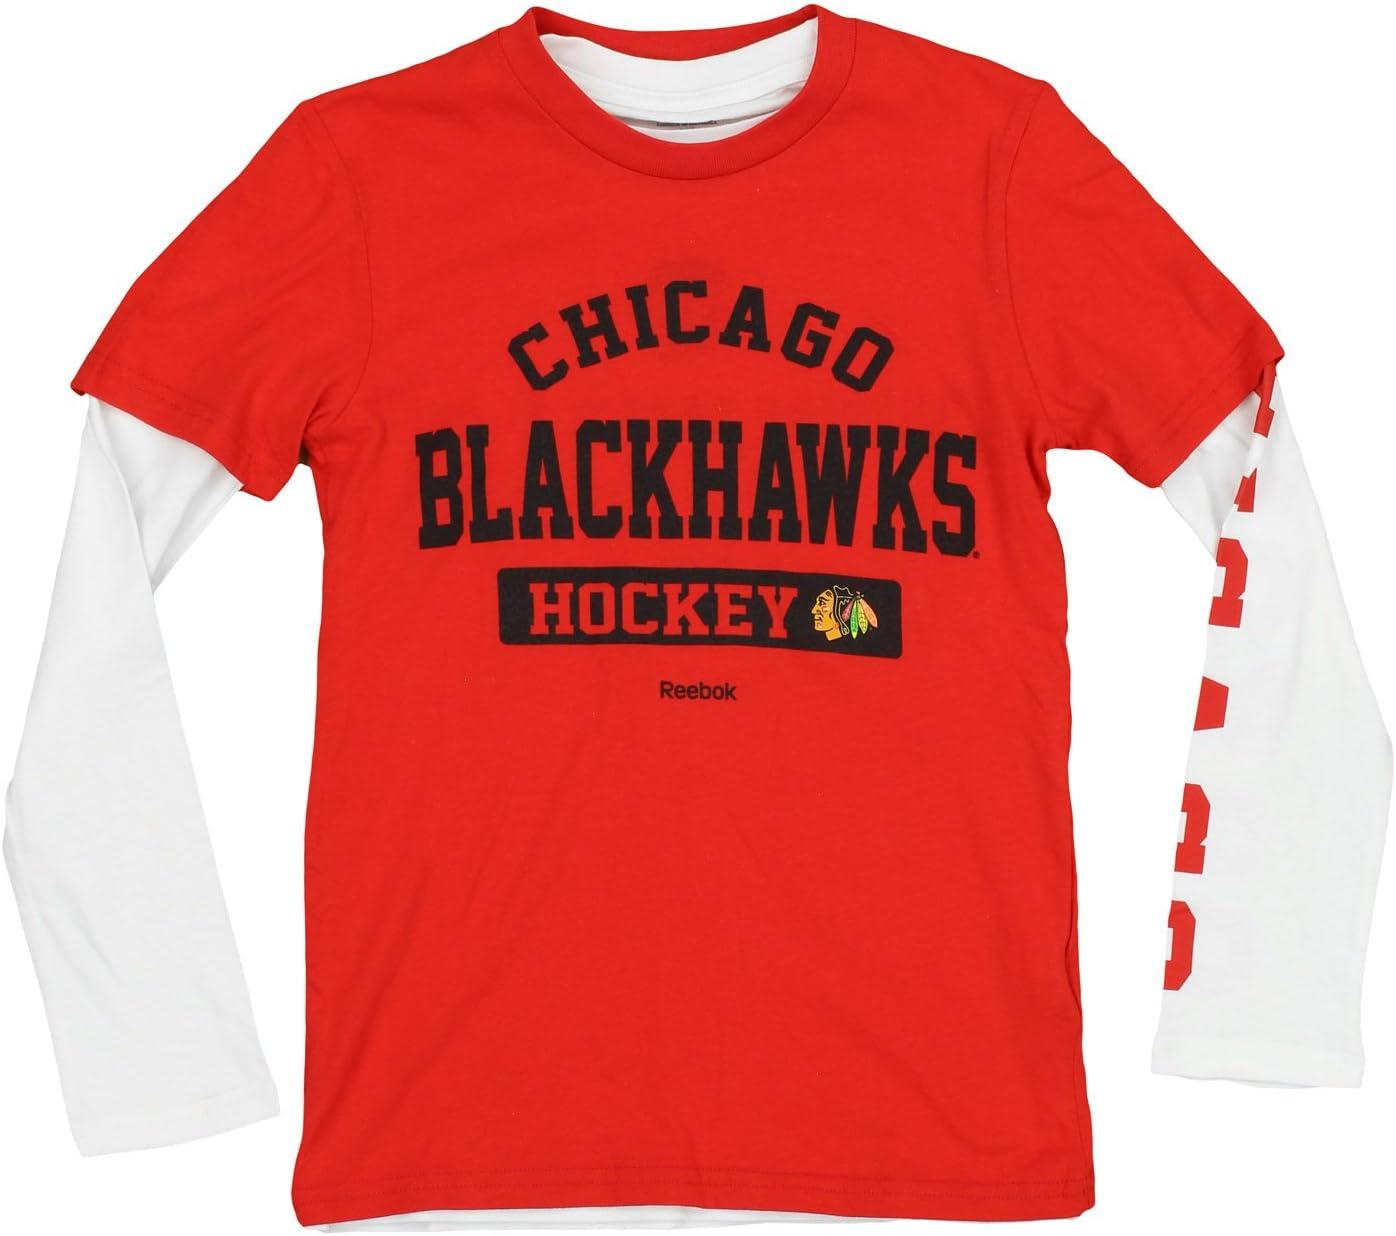 NHL Boys Youth (8 – 20 ) 3 in 1 Tシャツコンボセット長袖と半袖Tシャツセット、チームオプション